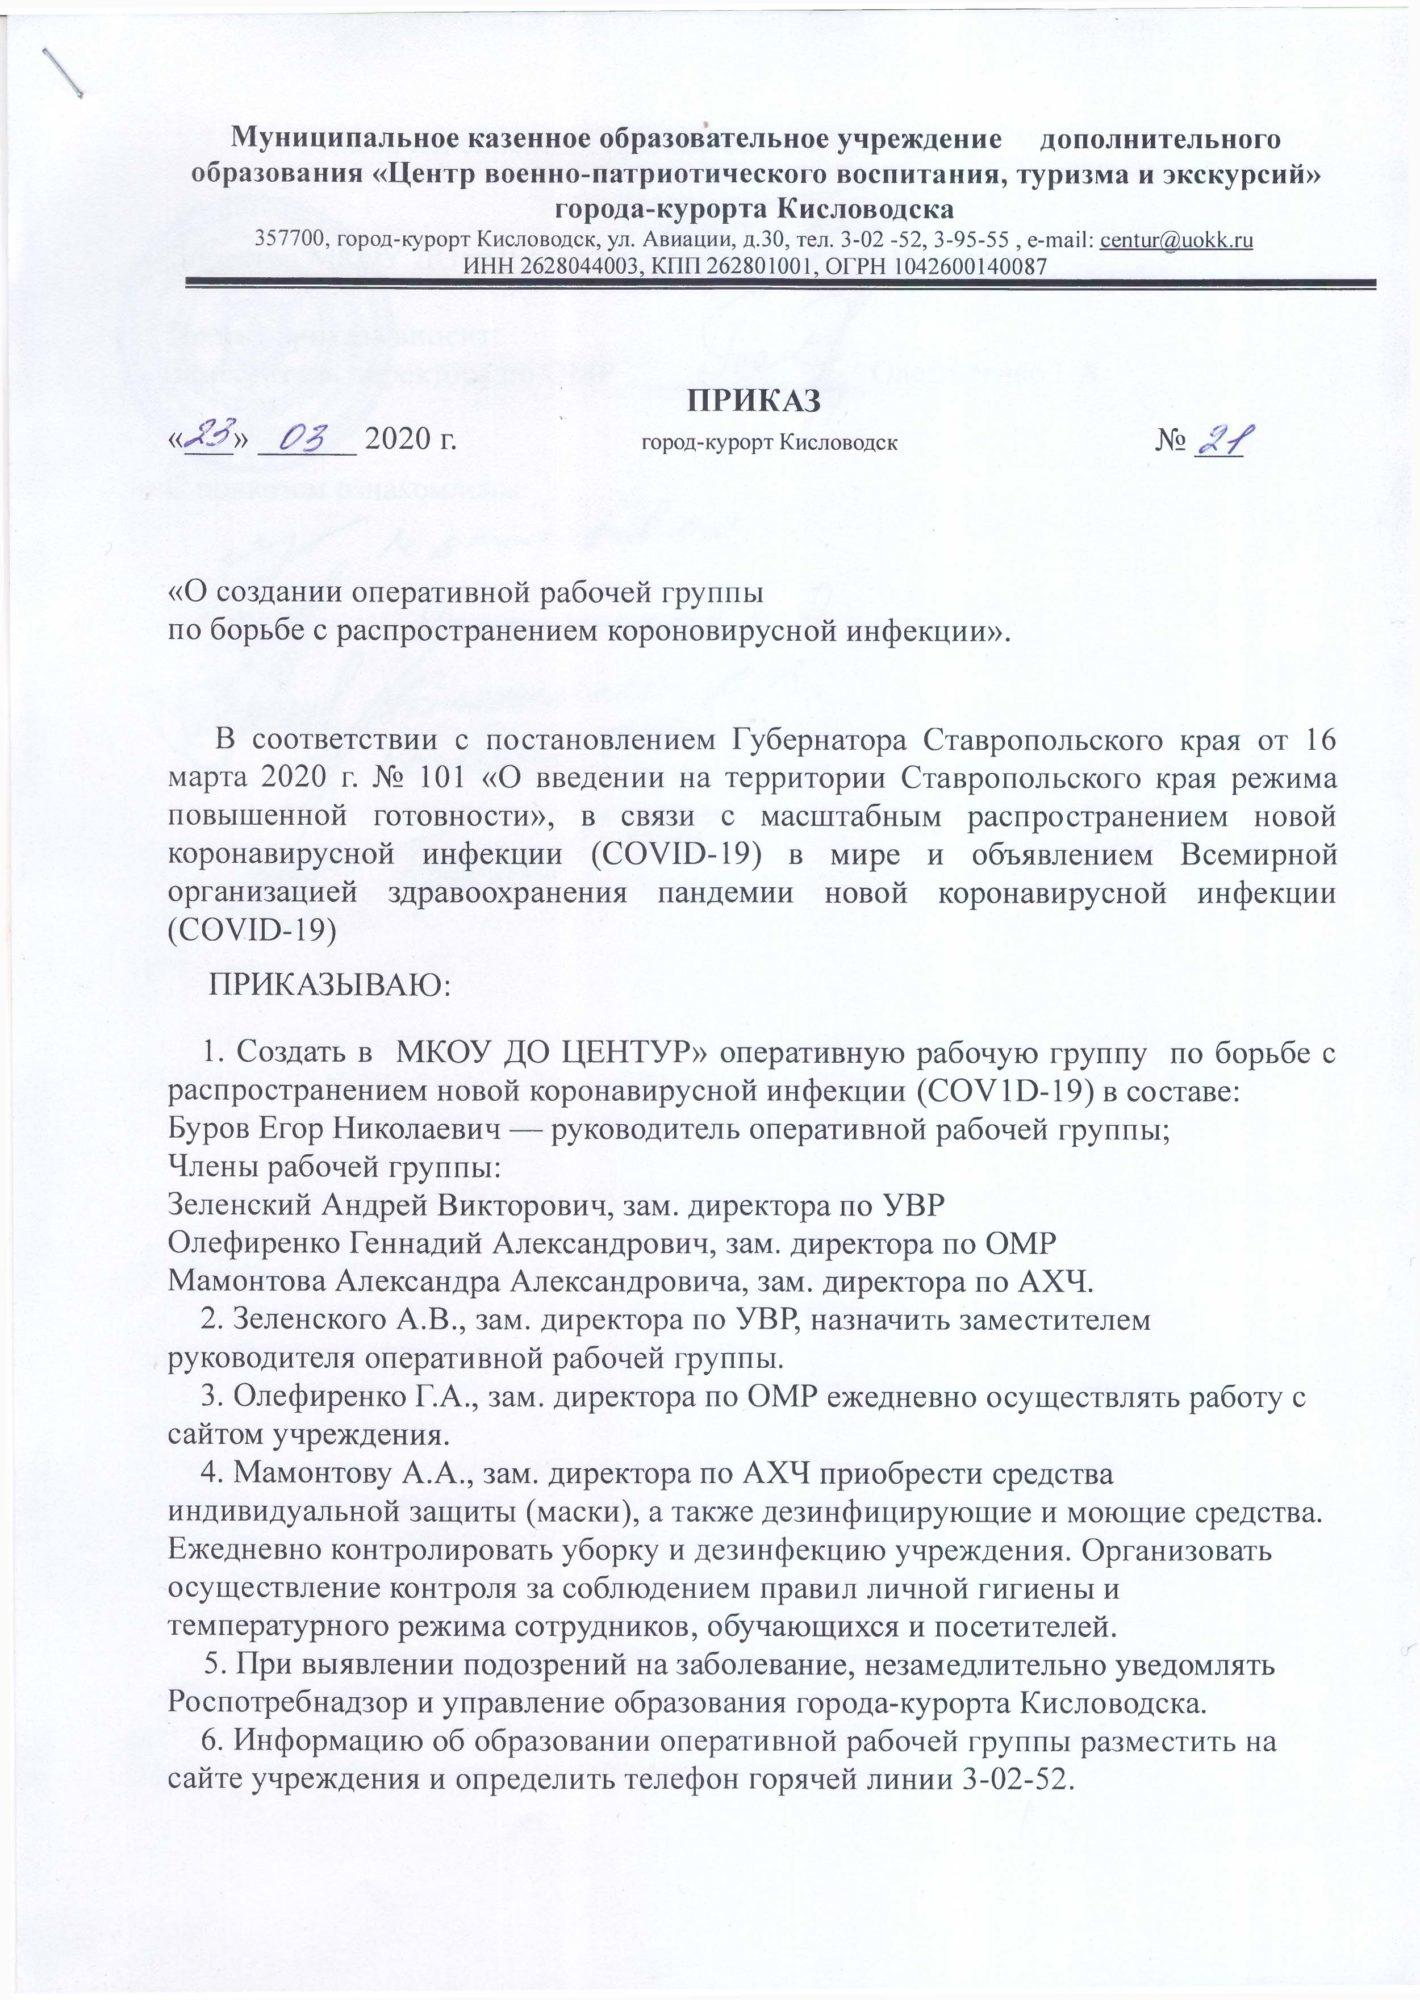 Приказ о создании оперативного штаба по борьбе с короновирусом-1